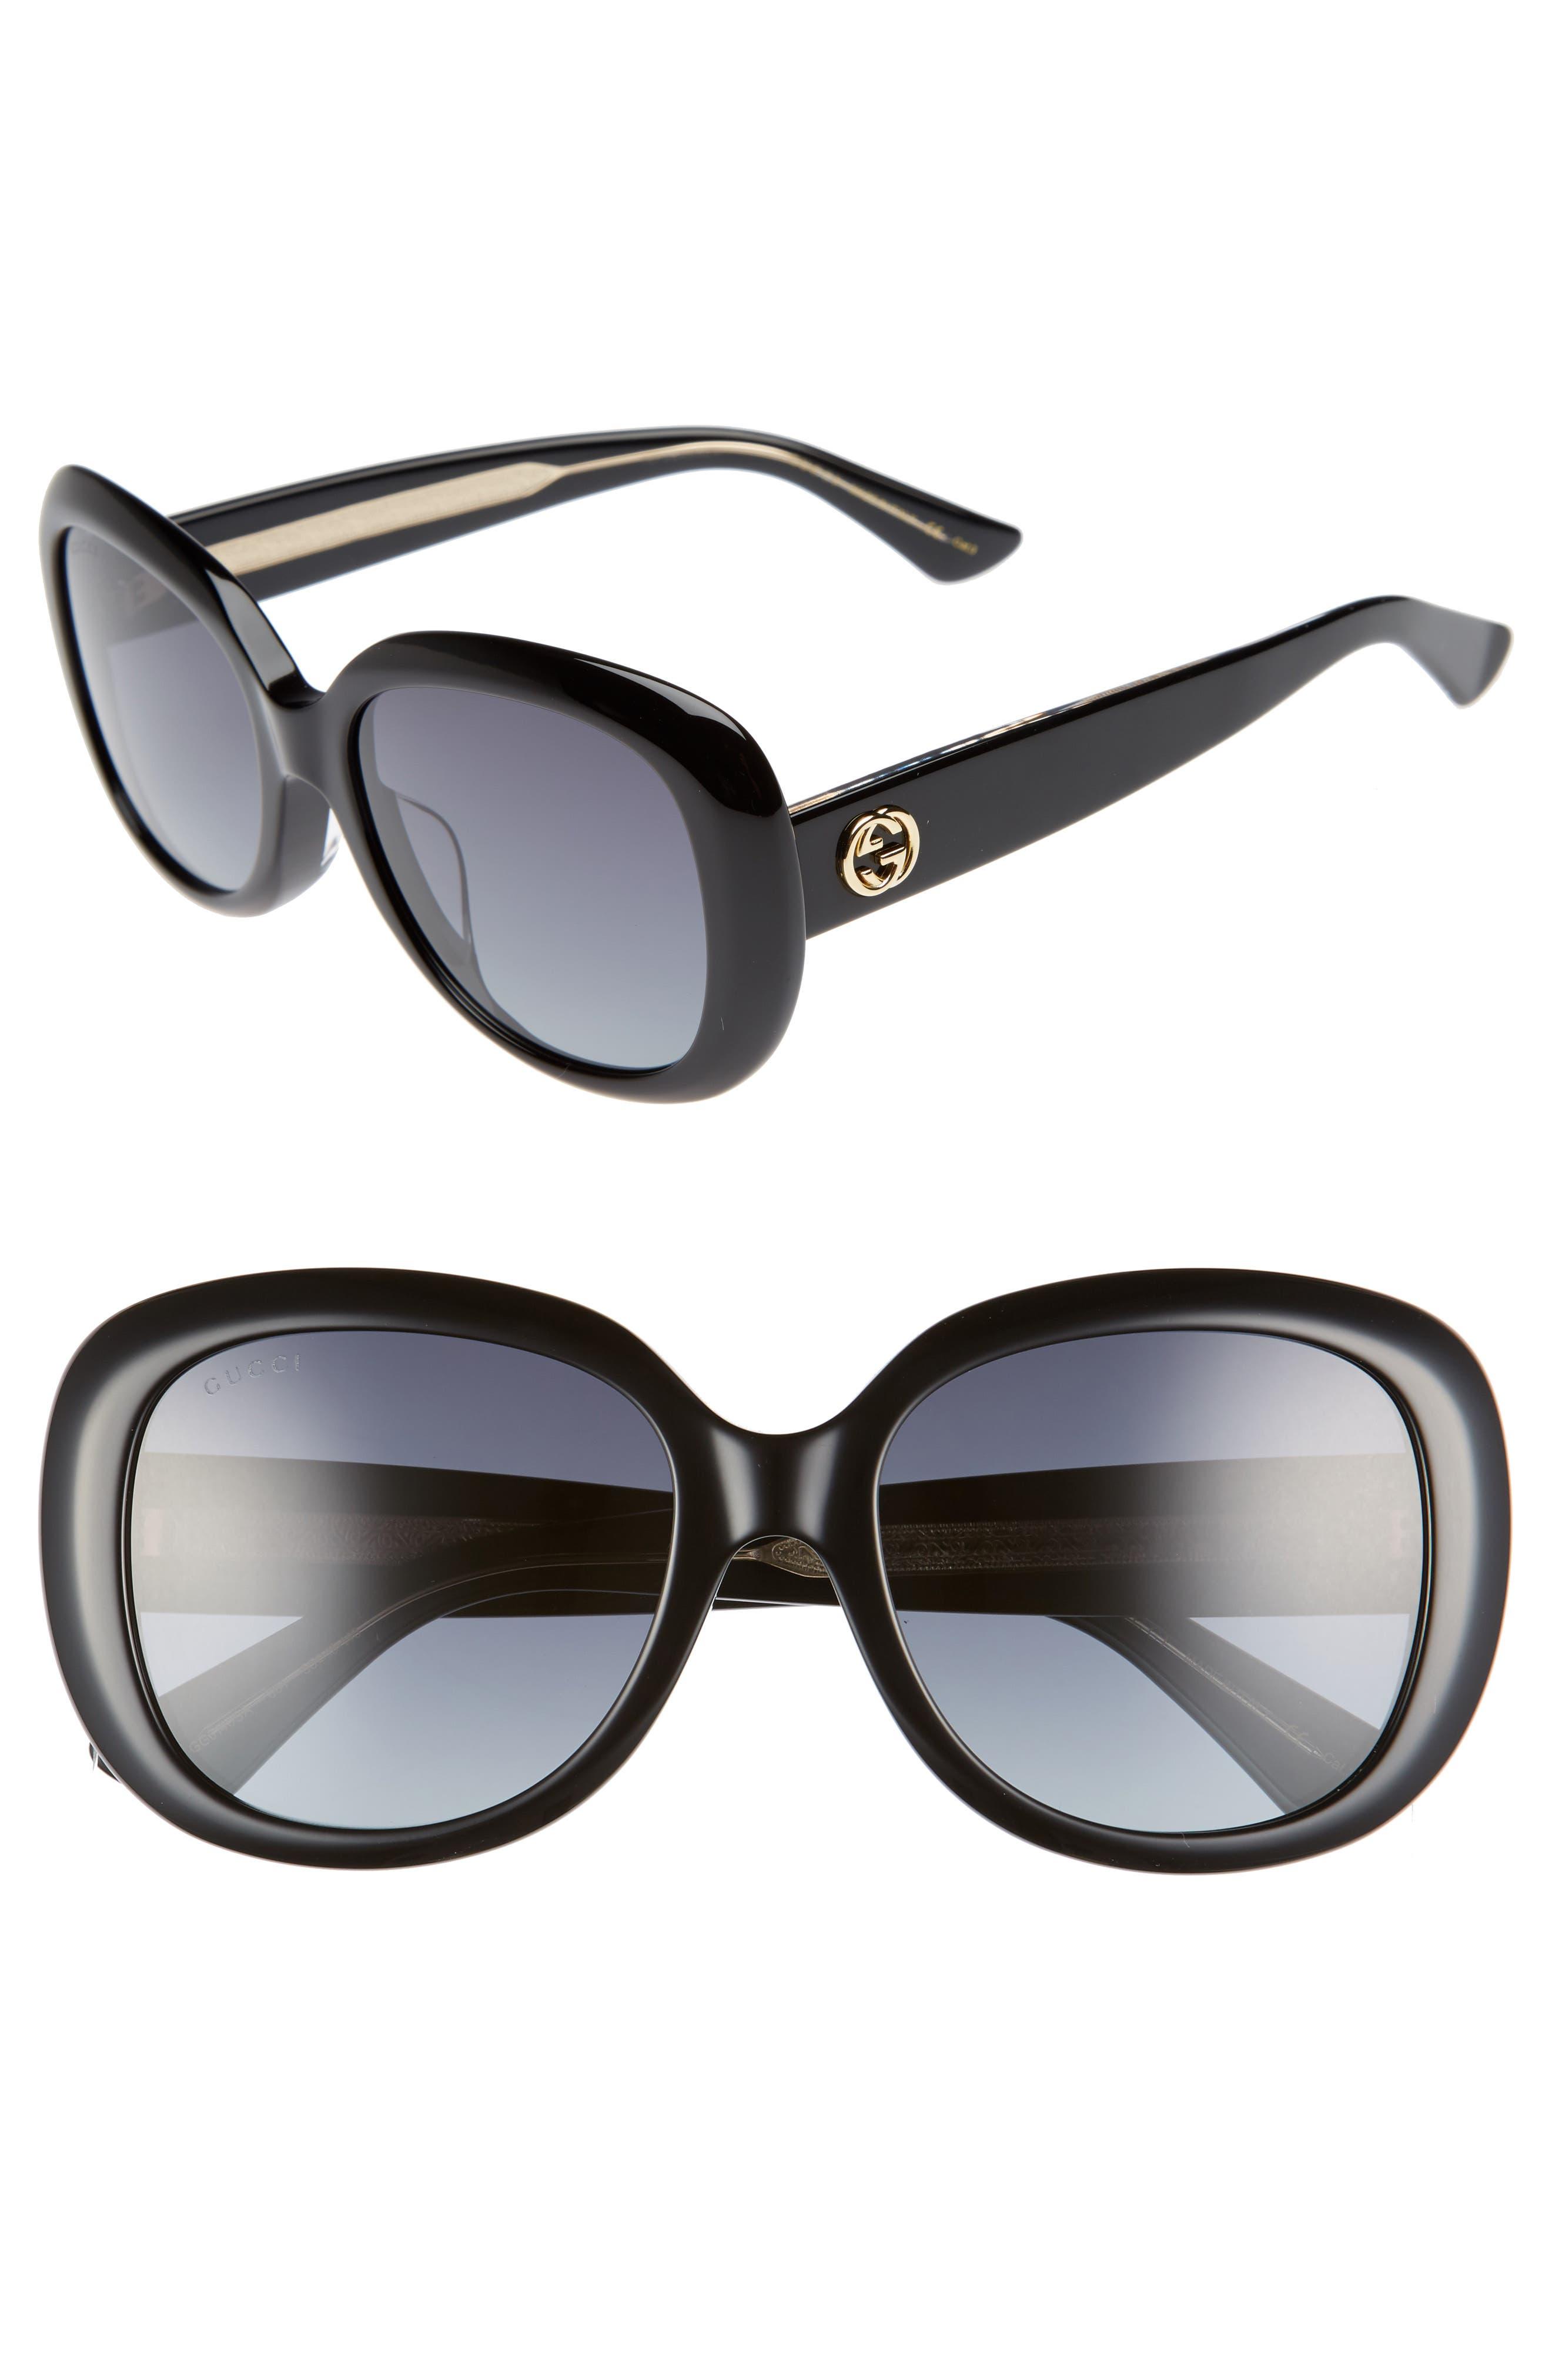 Gucci 55Mm Rectangular Sunglasses - Black/ Grey